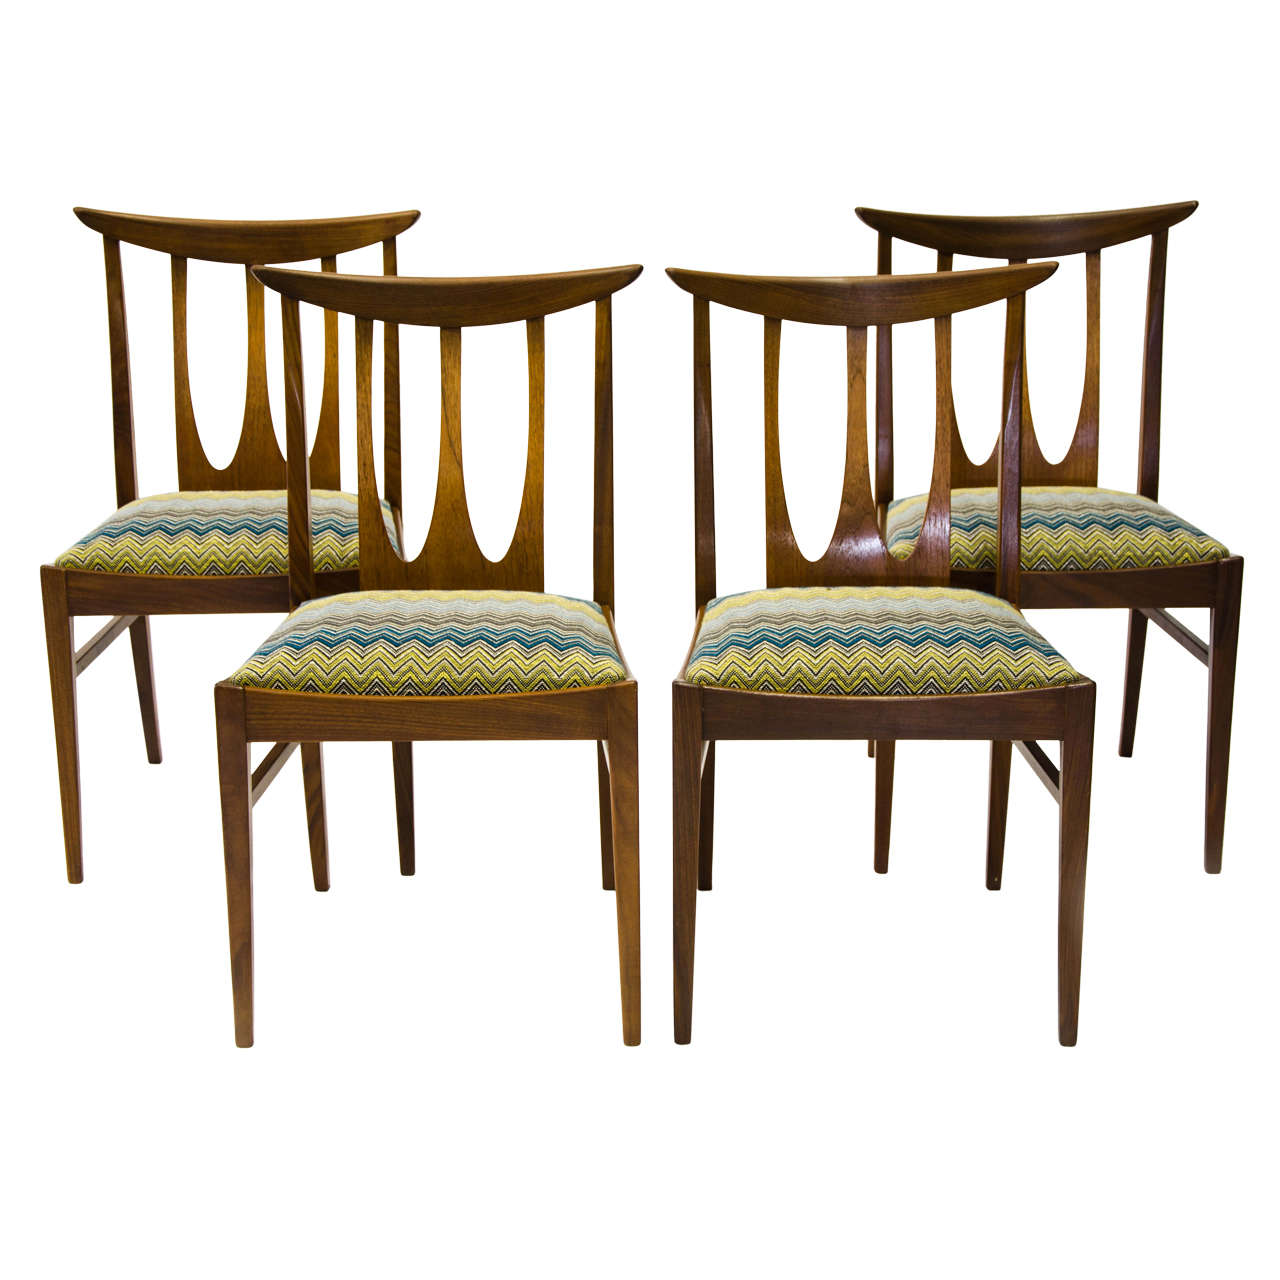 British 1960s Set Of G-Plan Dining Chairs At 1stdibs